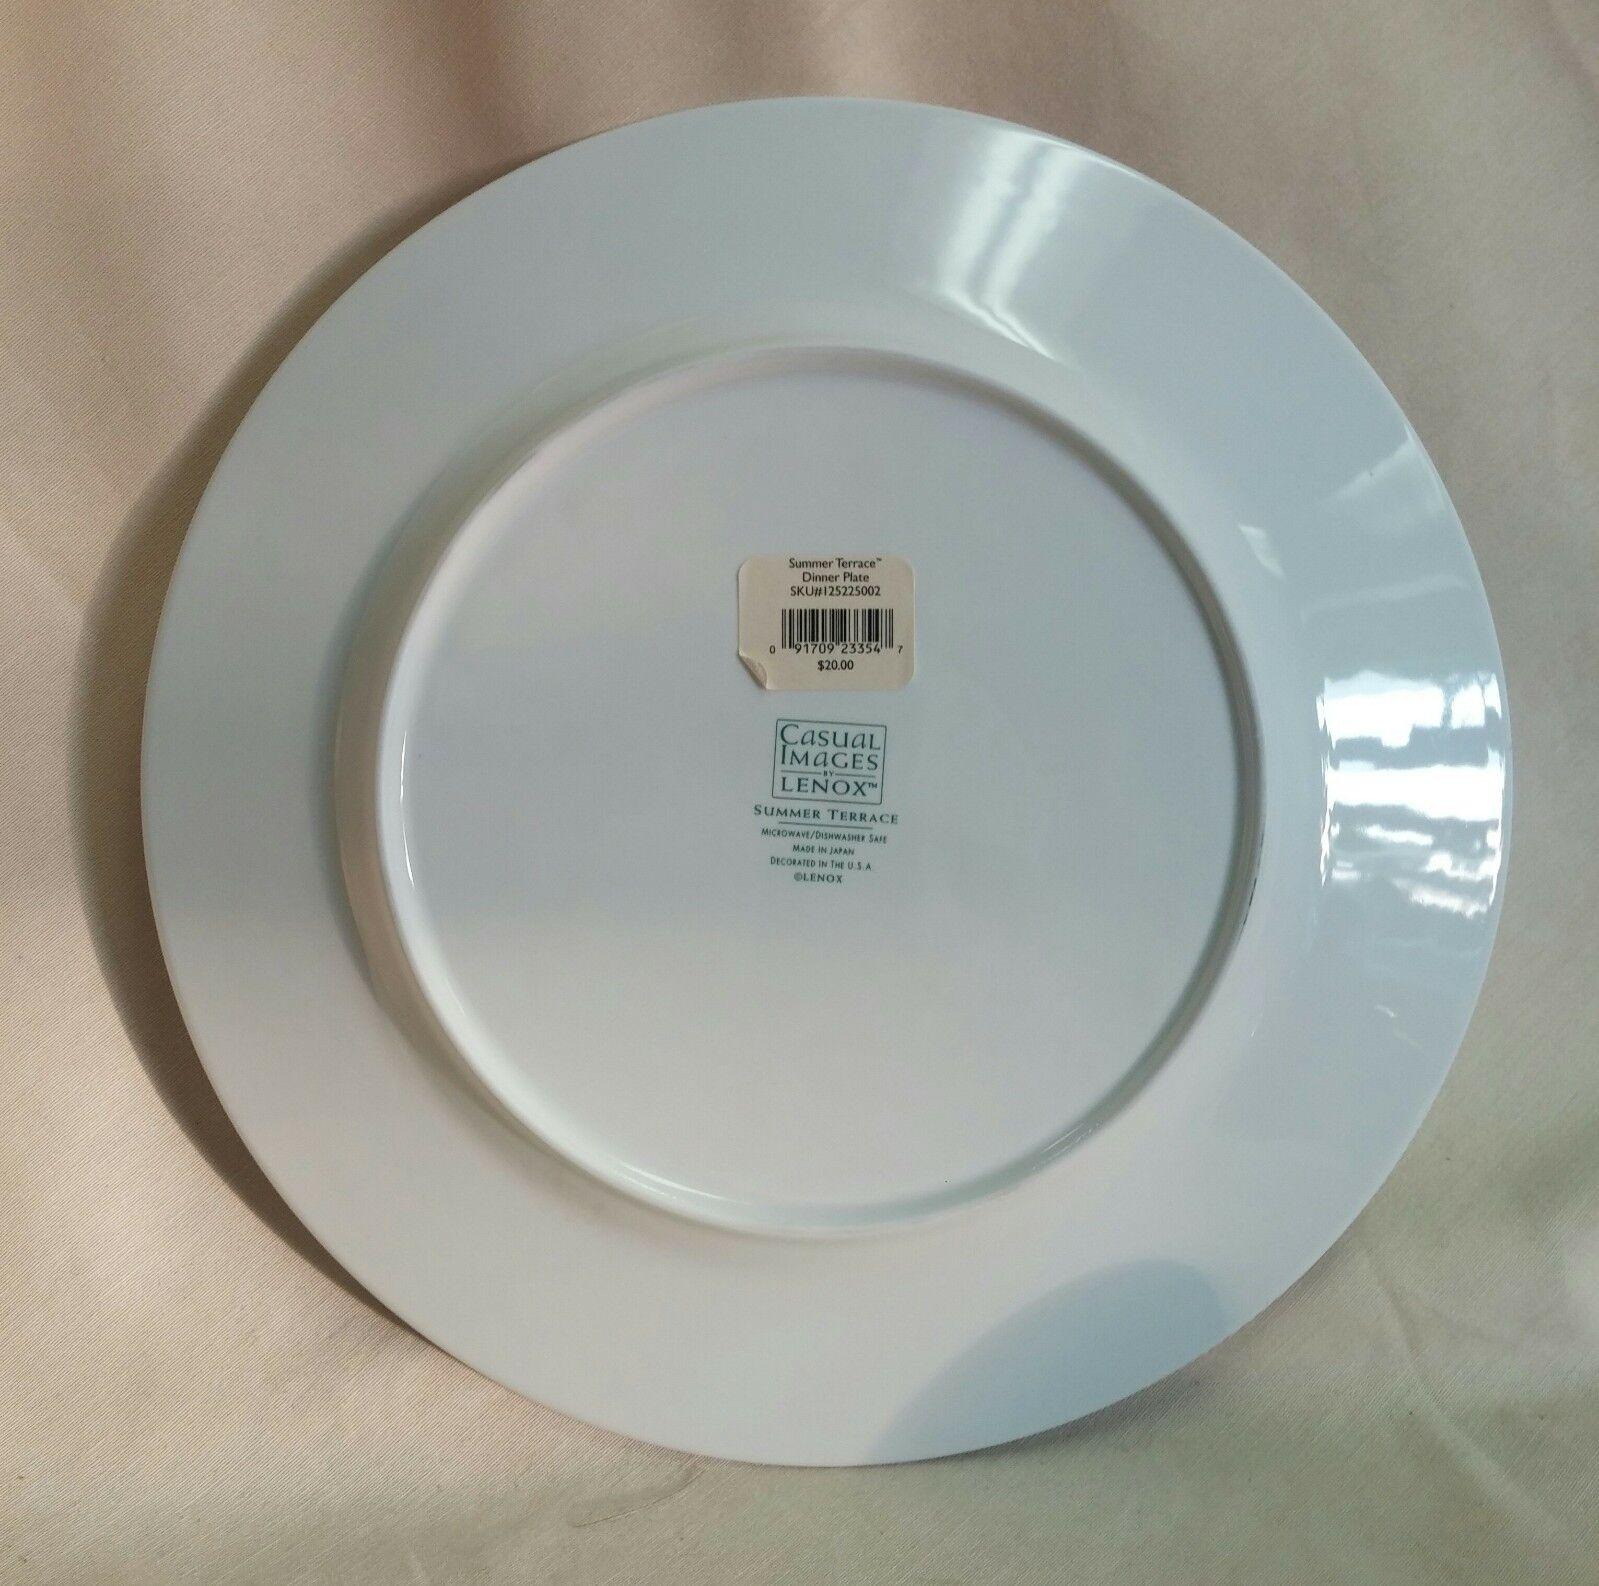 LENOX SUMMER TERRACE Dinner, Salad, Cereal Bowl, Cup Saucer, Mug - $129.95